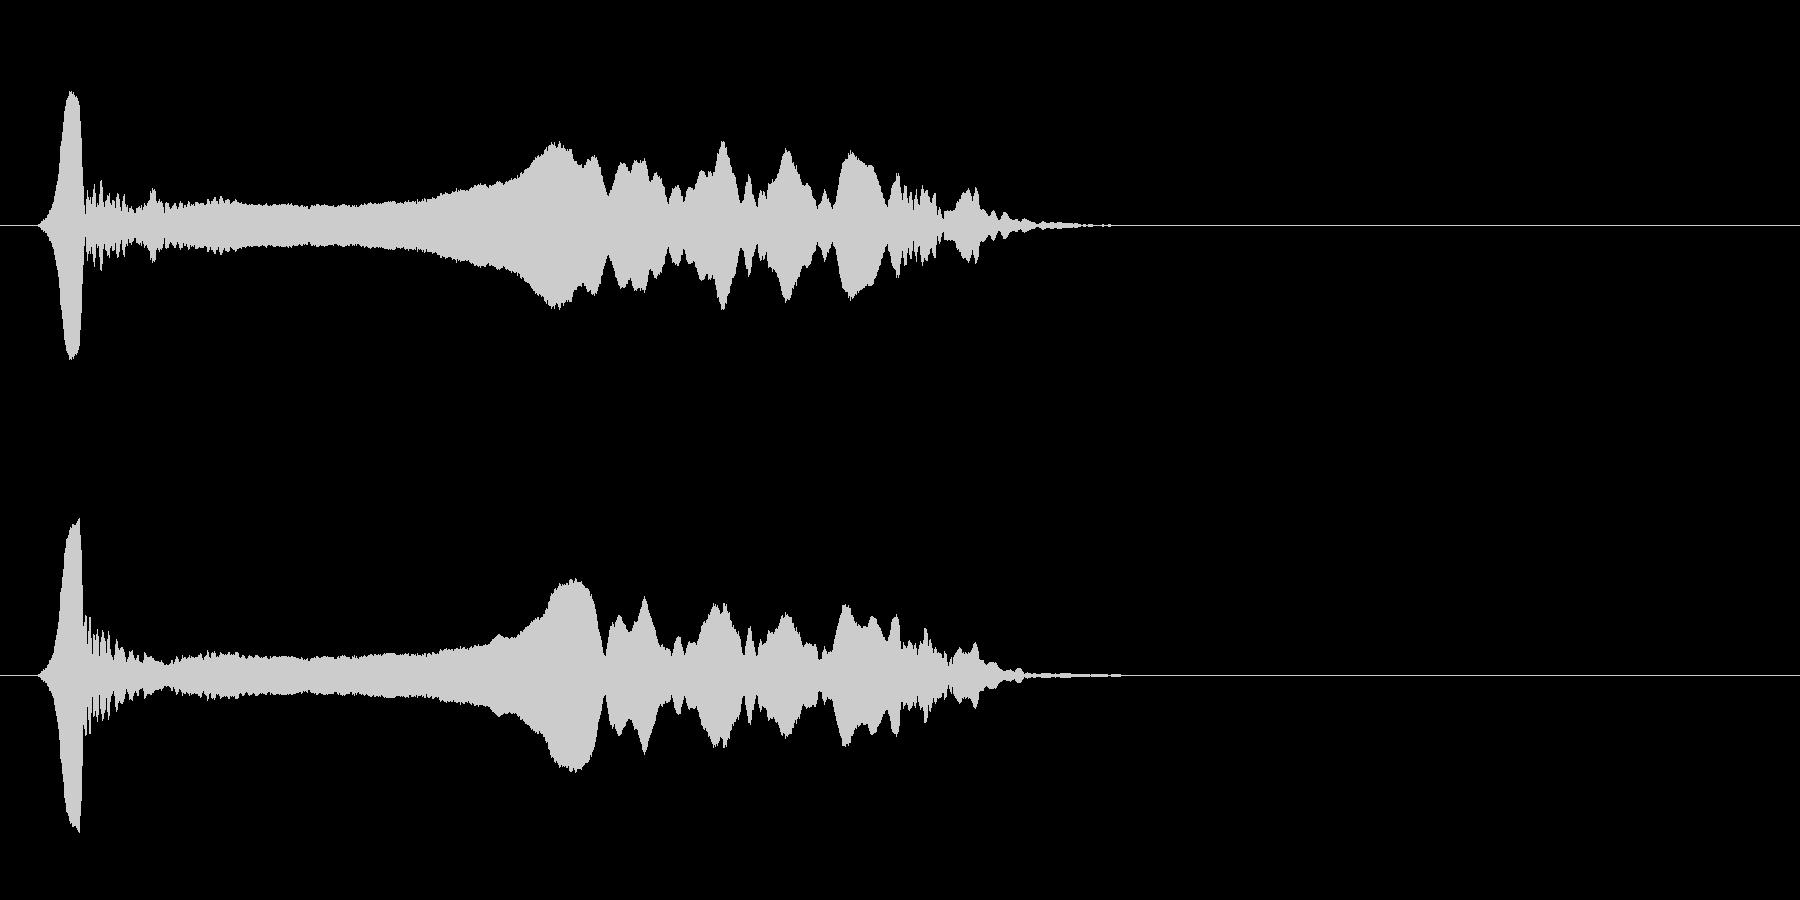 尺八 生演奏 古典風#19の未再生の波形